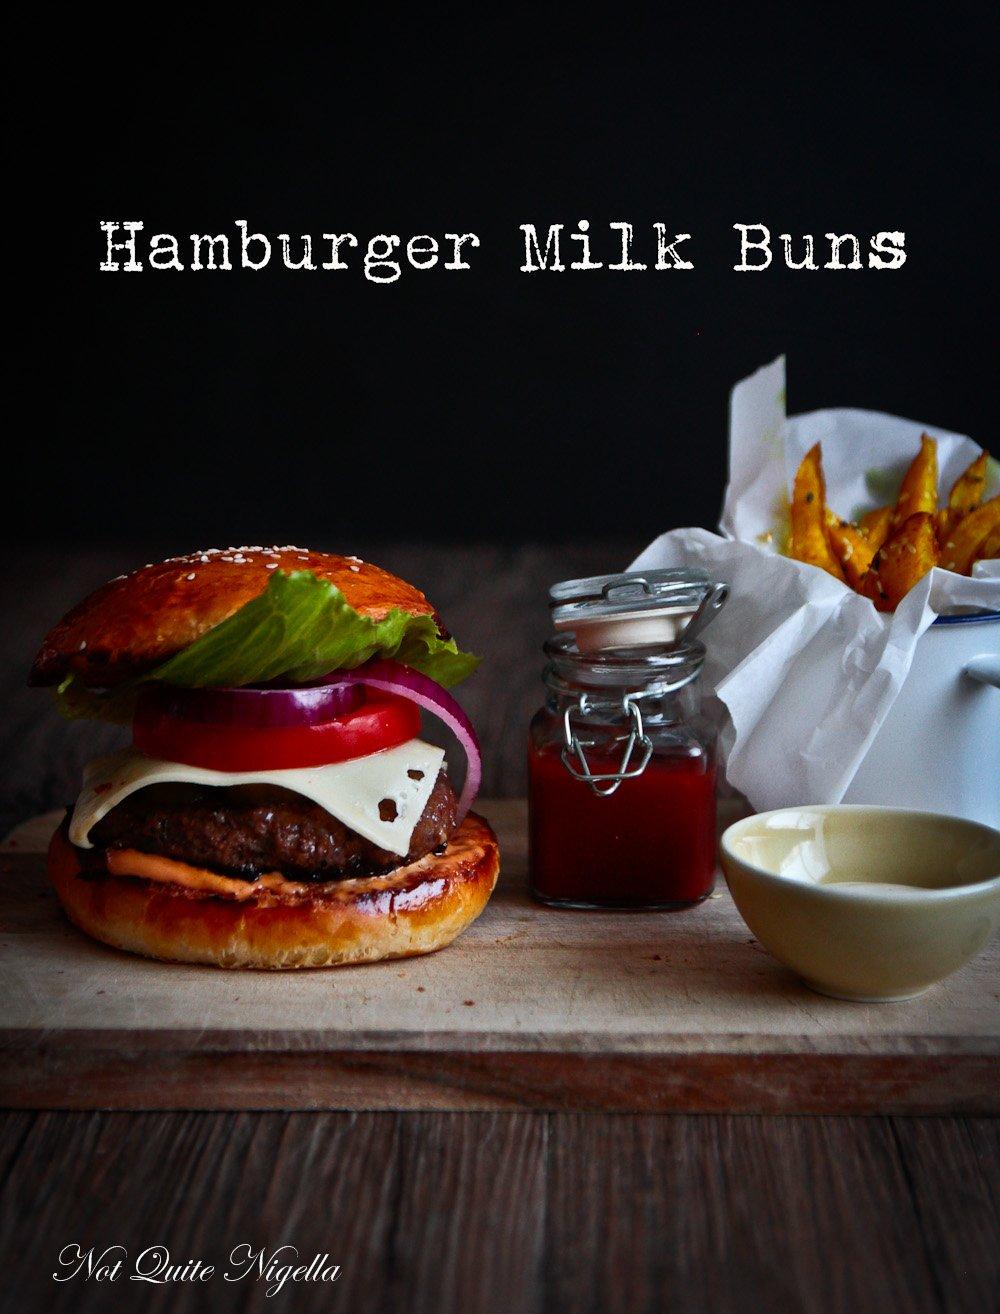 Hamburger Milk Buns